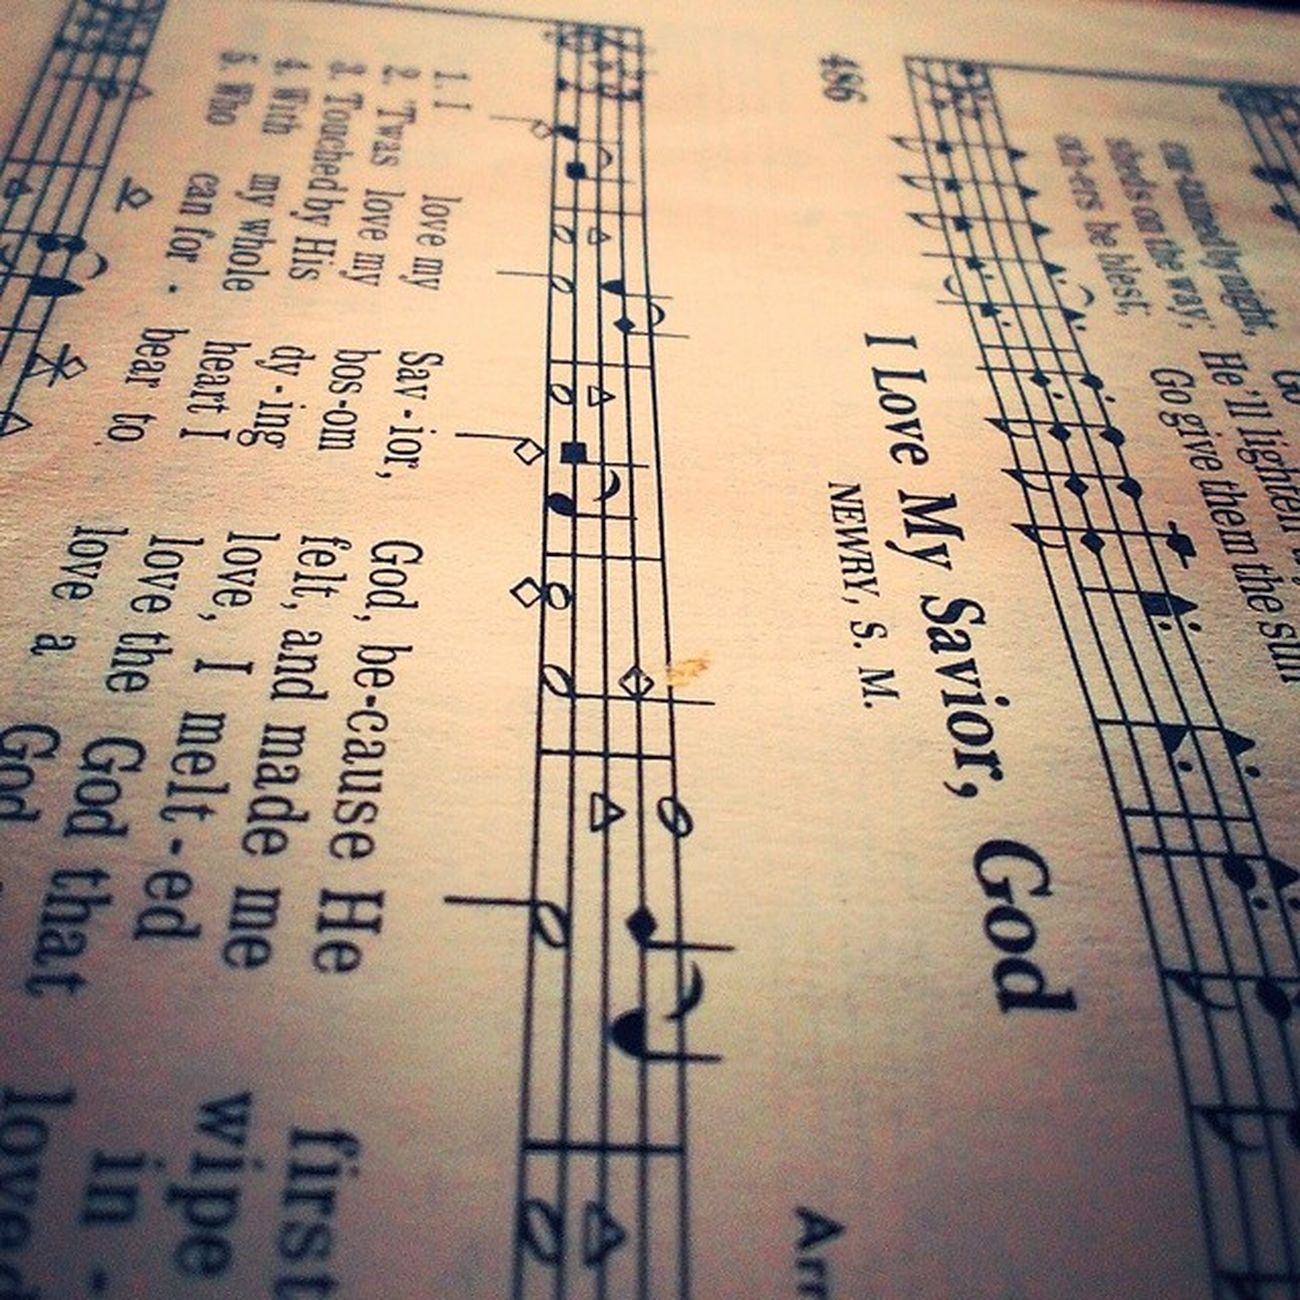 My favorite hymn 🎼🎵🎶❤ HarmonyHighlands Singingschool 2014 Hhss cadescove primitivebaptist photography God love singing acappella solfege shapenotes IlovemysaviorGod